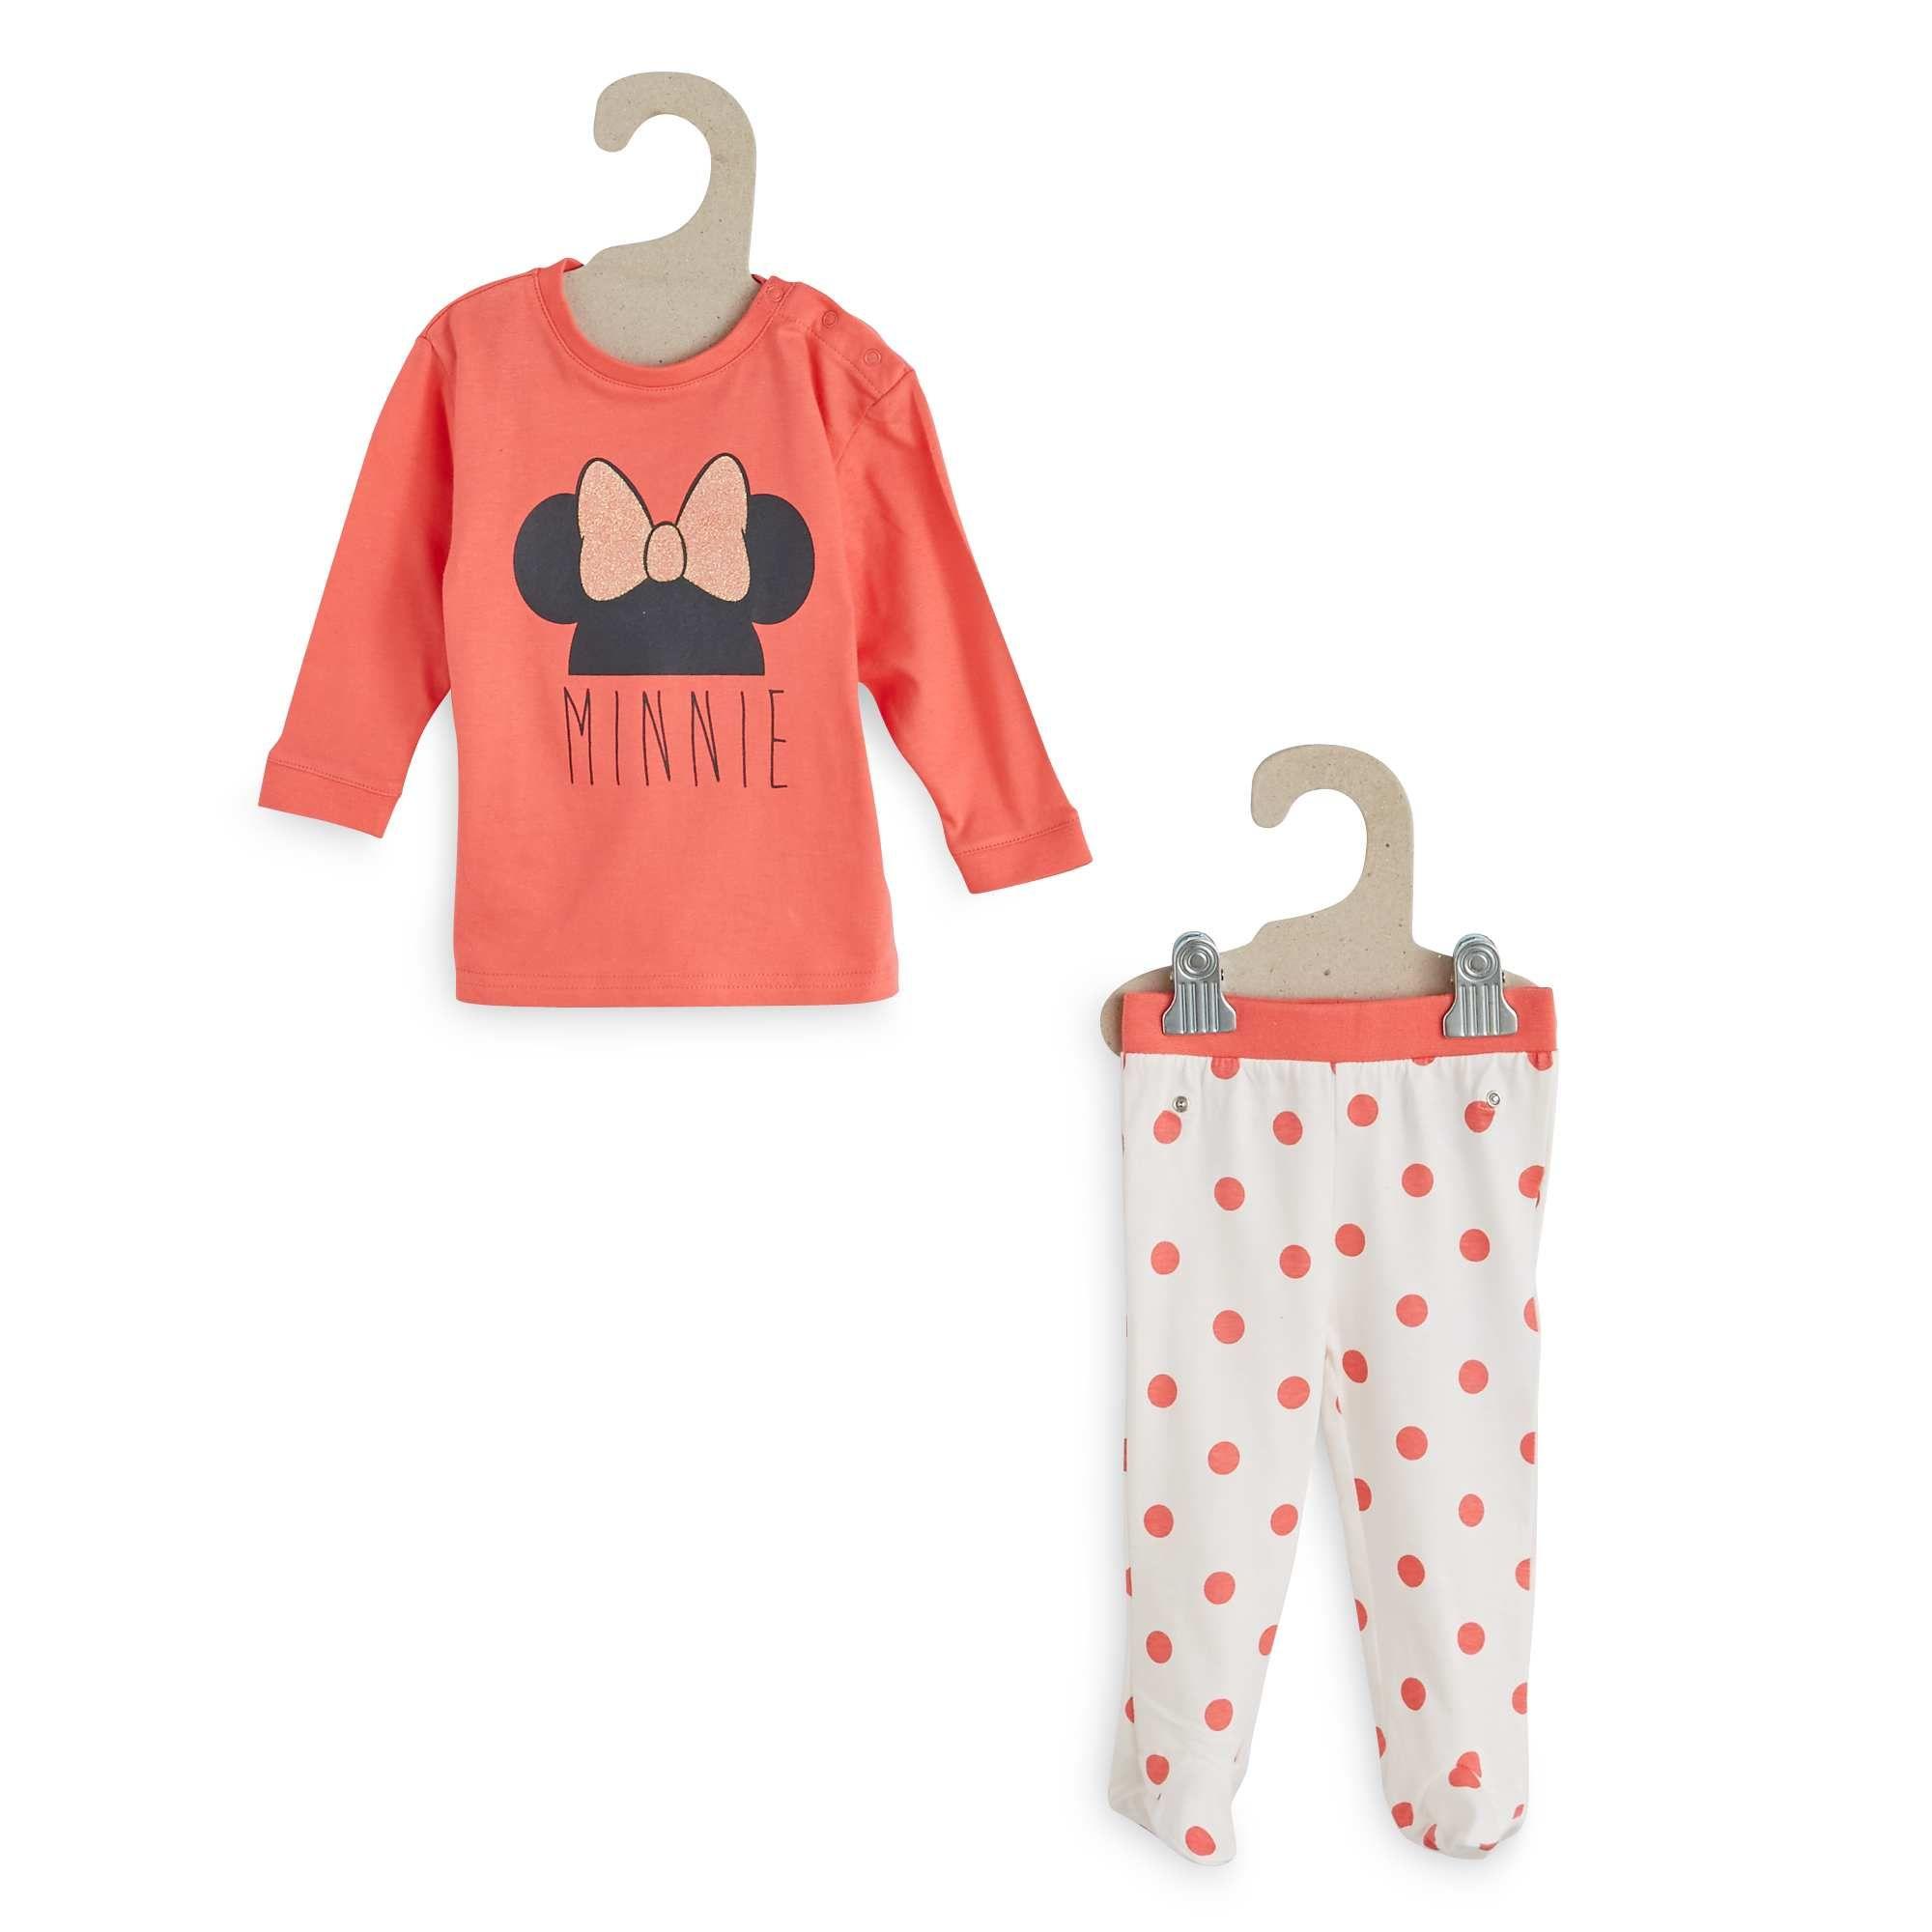 582787bf26a7d Ensemble pyjama 2 pièces  Minnie  Petite fille - Kiabi - 7